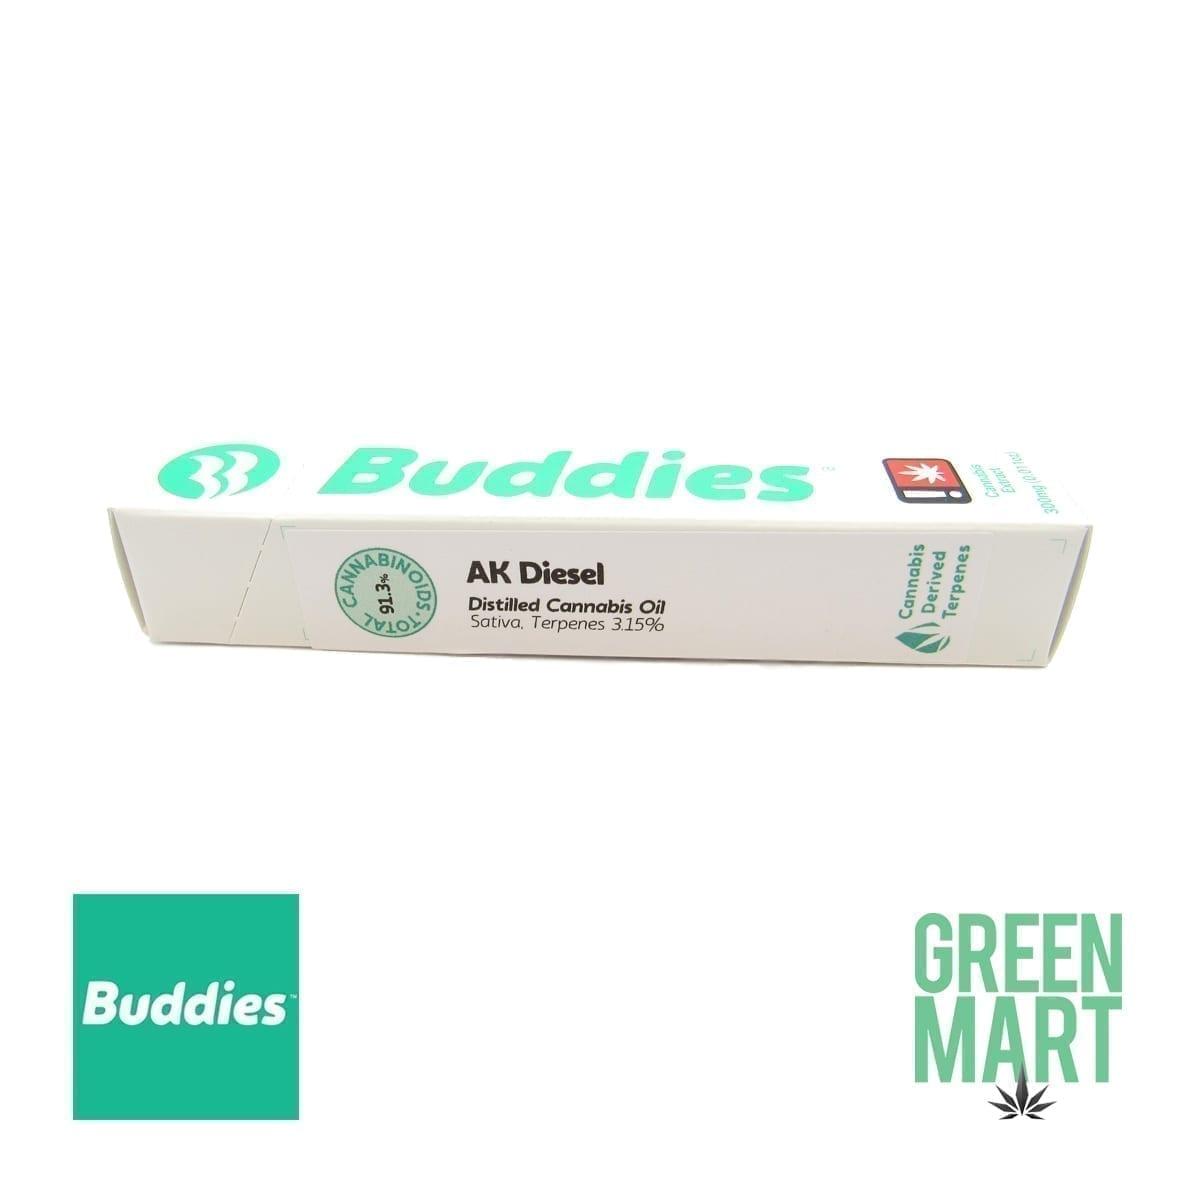 Buddies Brand Disposable Vape - AK Diesel